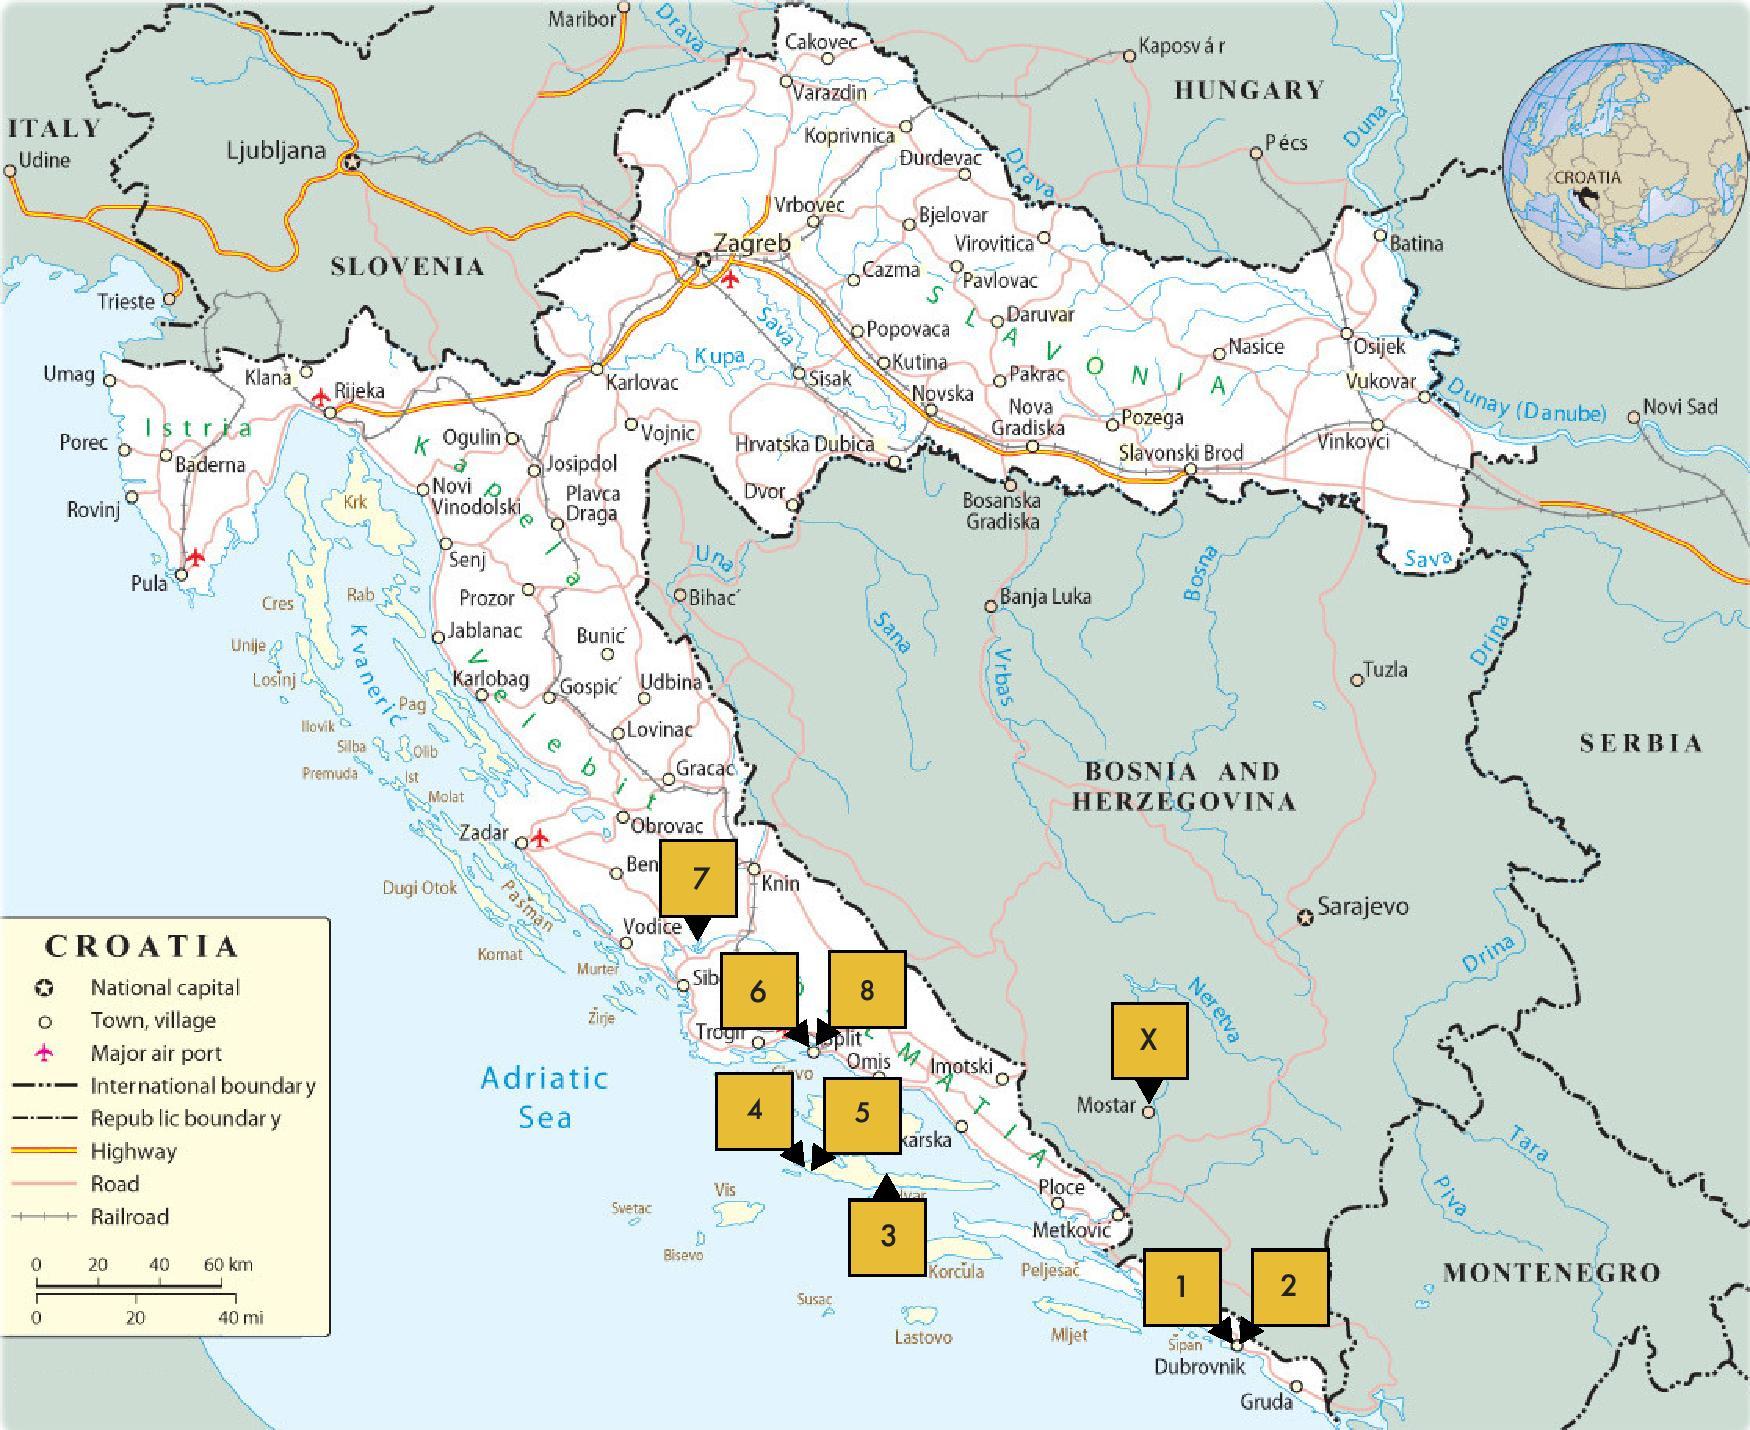 THE BIG TRIP: CROATIA MAP